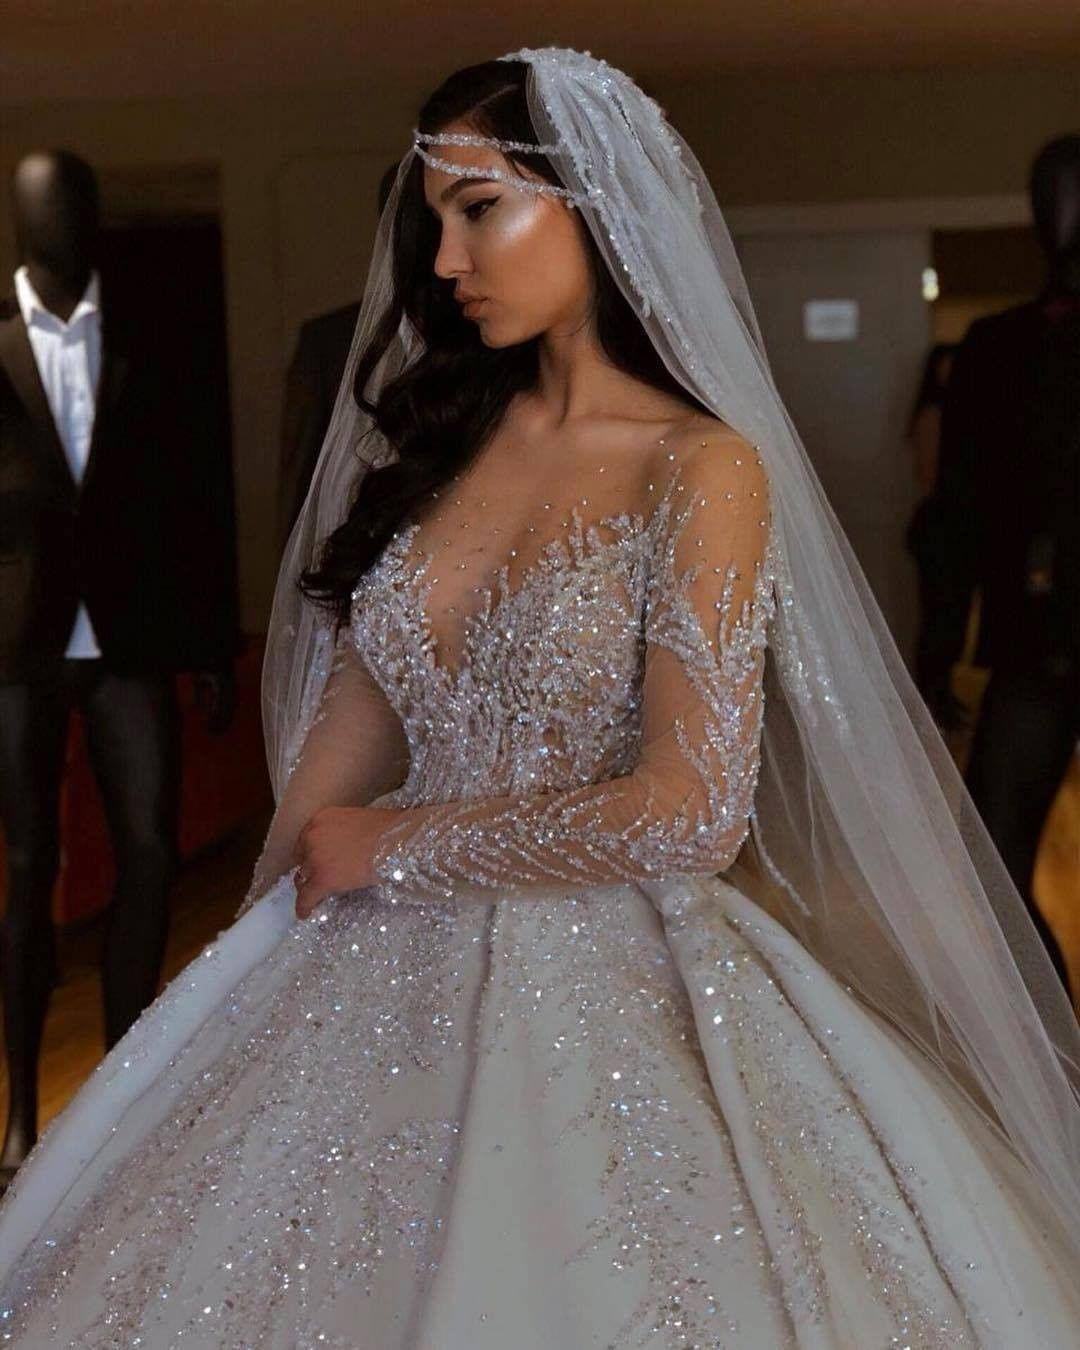 Estates Library Ball Gowns Wedding Satin Wedding Gown Wedding Dress Long Sleeve [ 1350 x 1080 Pixel ]